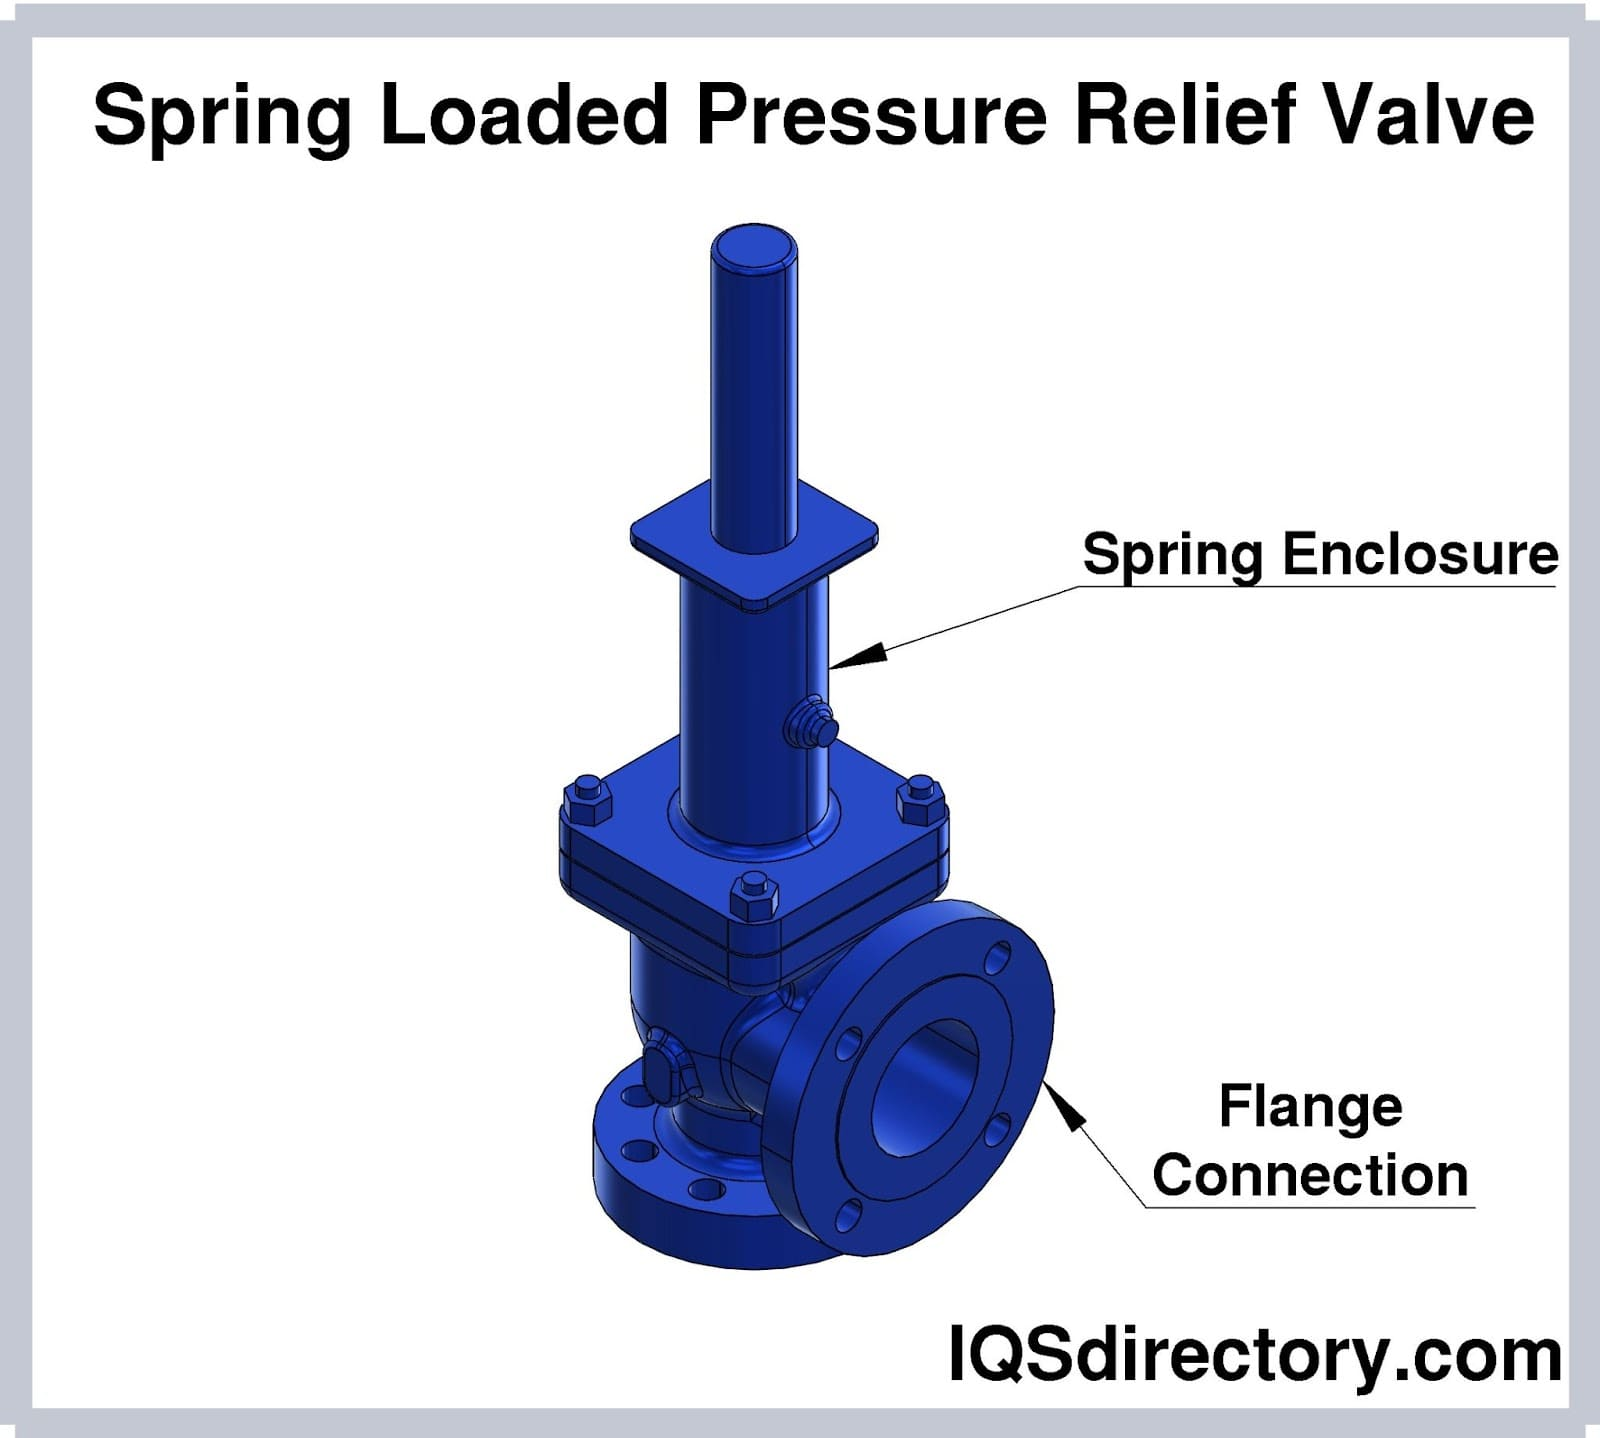 Spring Loaded Pressure Relief Valve